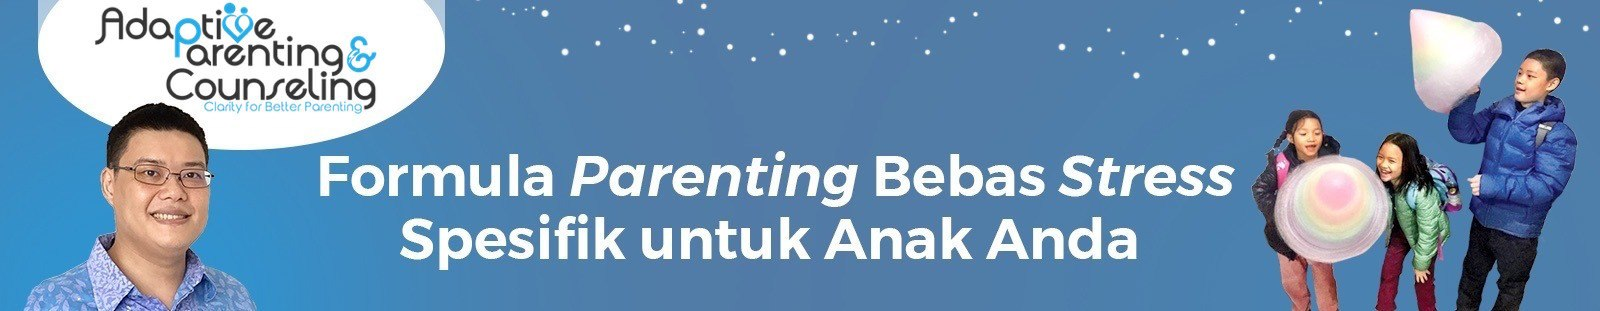 Adaptive Parenting